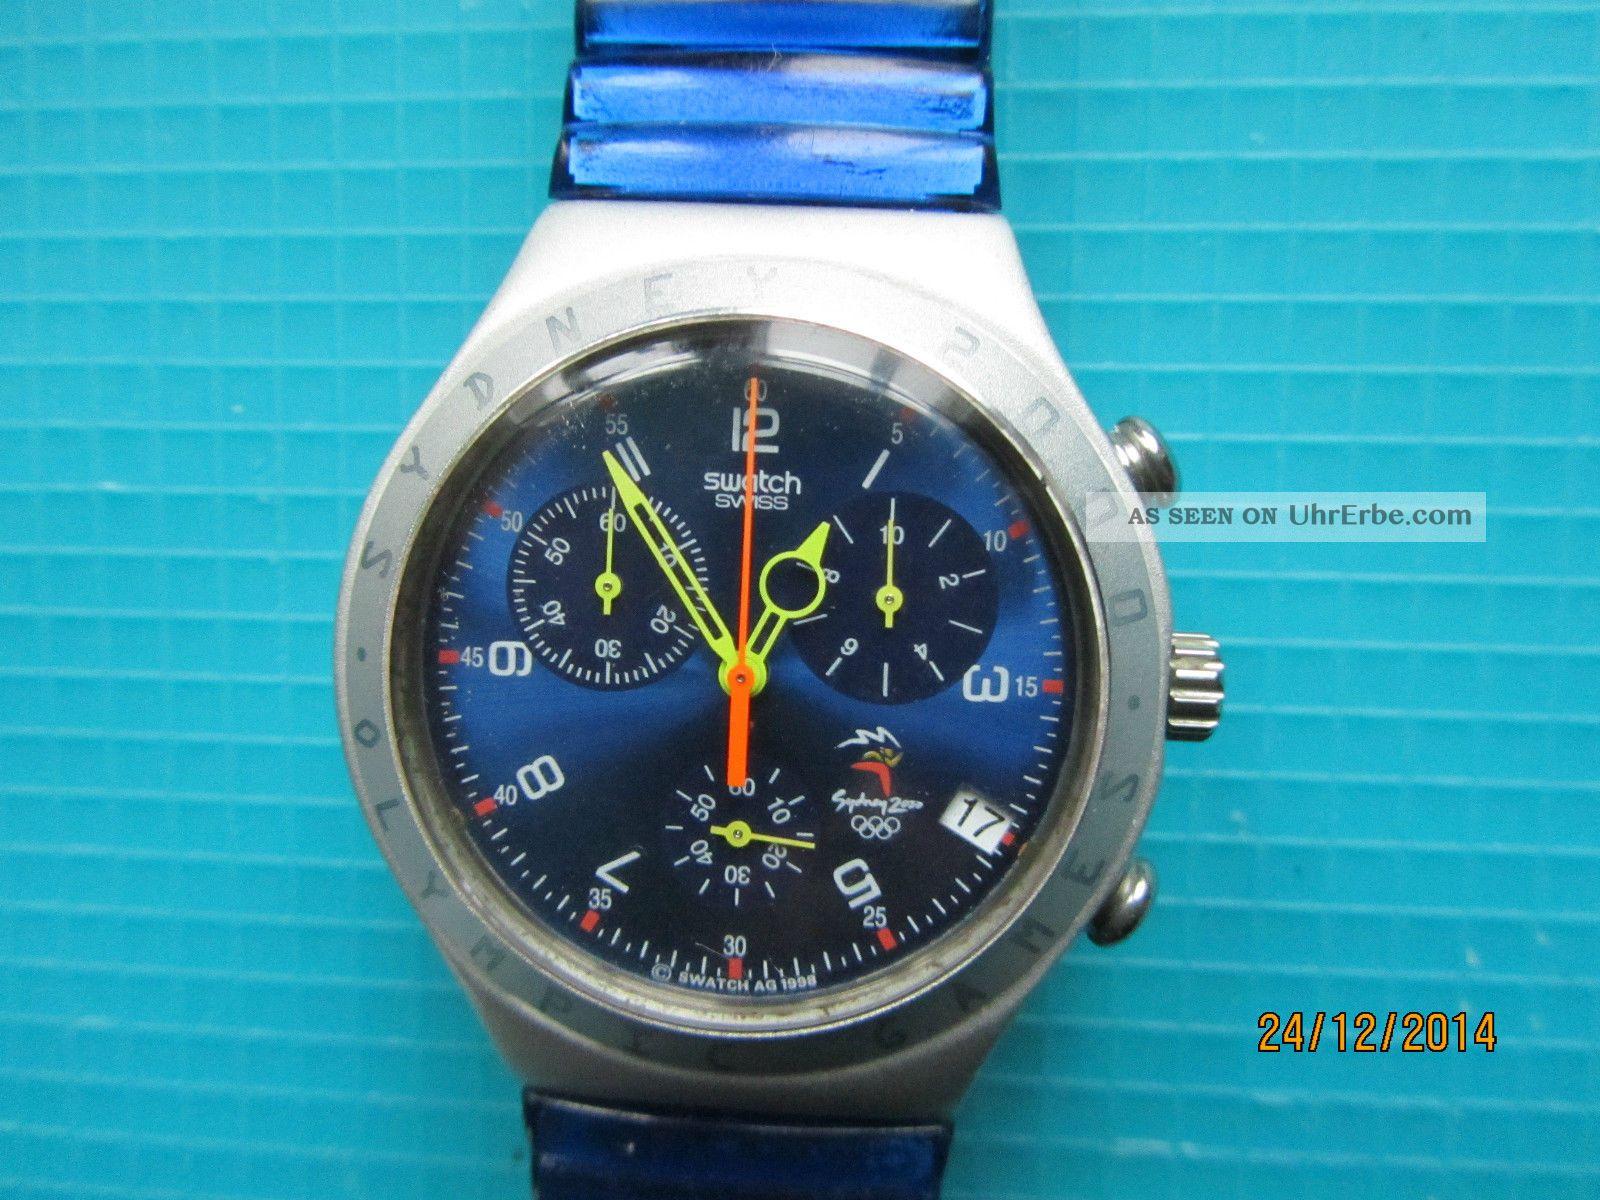 Swatch Chrono Rushcutters Olympic Spezial V 1999 Mit Blauen Stretcharmband Armbanduhren Bild